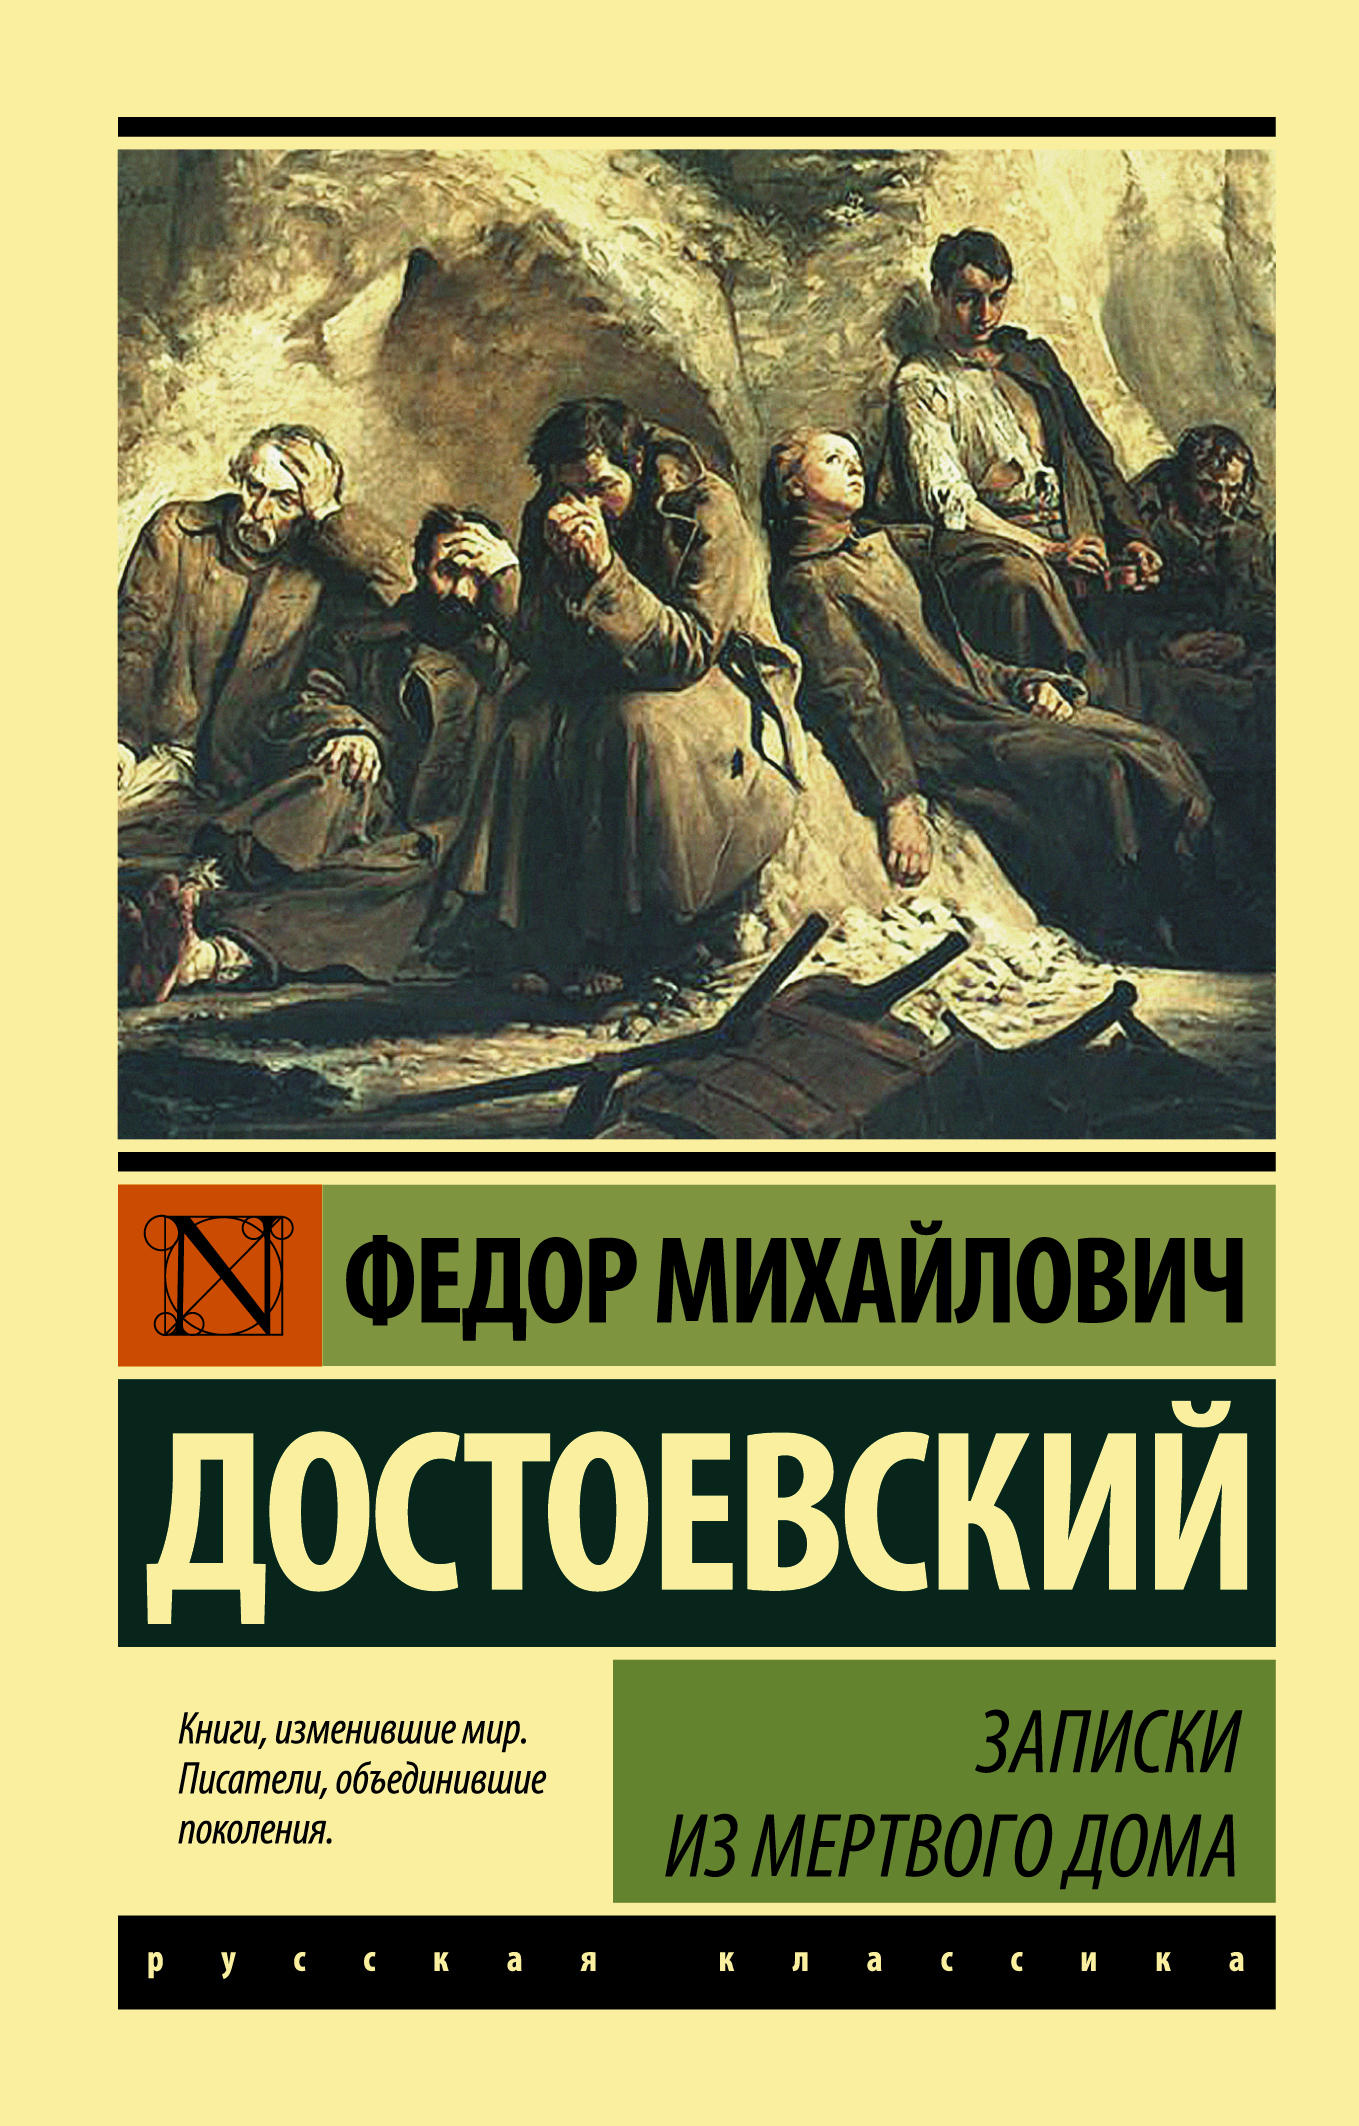 Записки из Мертвого дома ( Федор Михайлович Достоевский  )